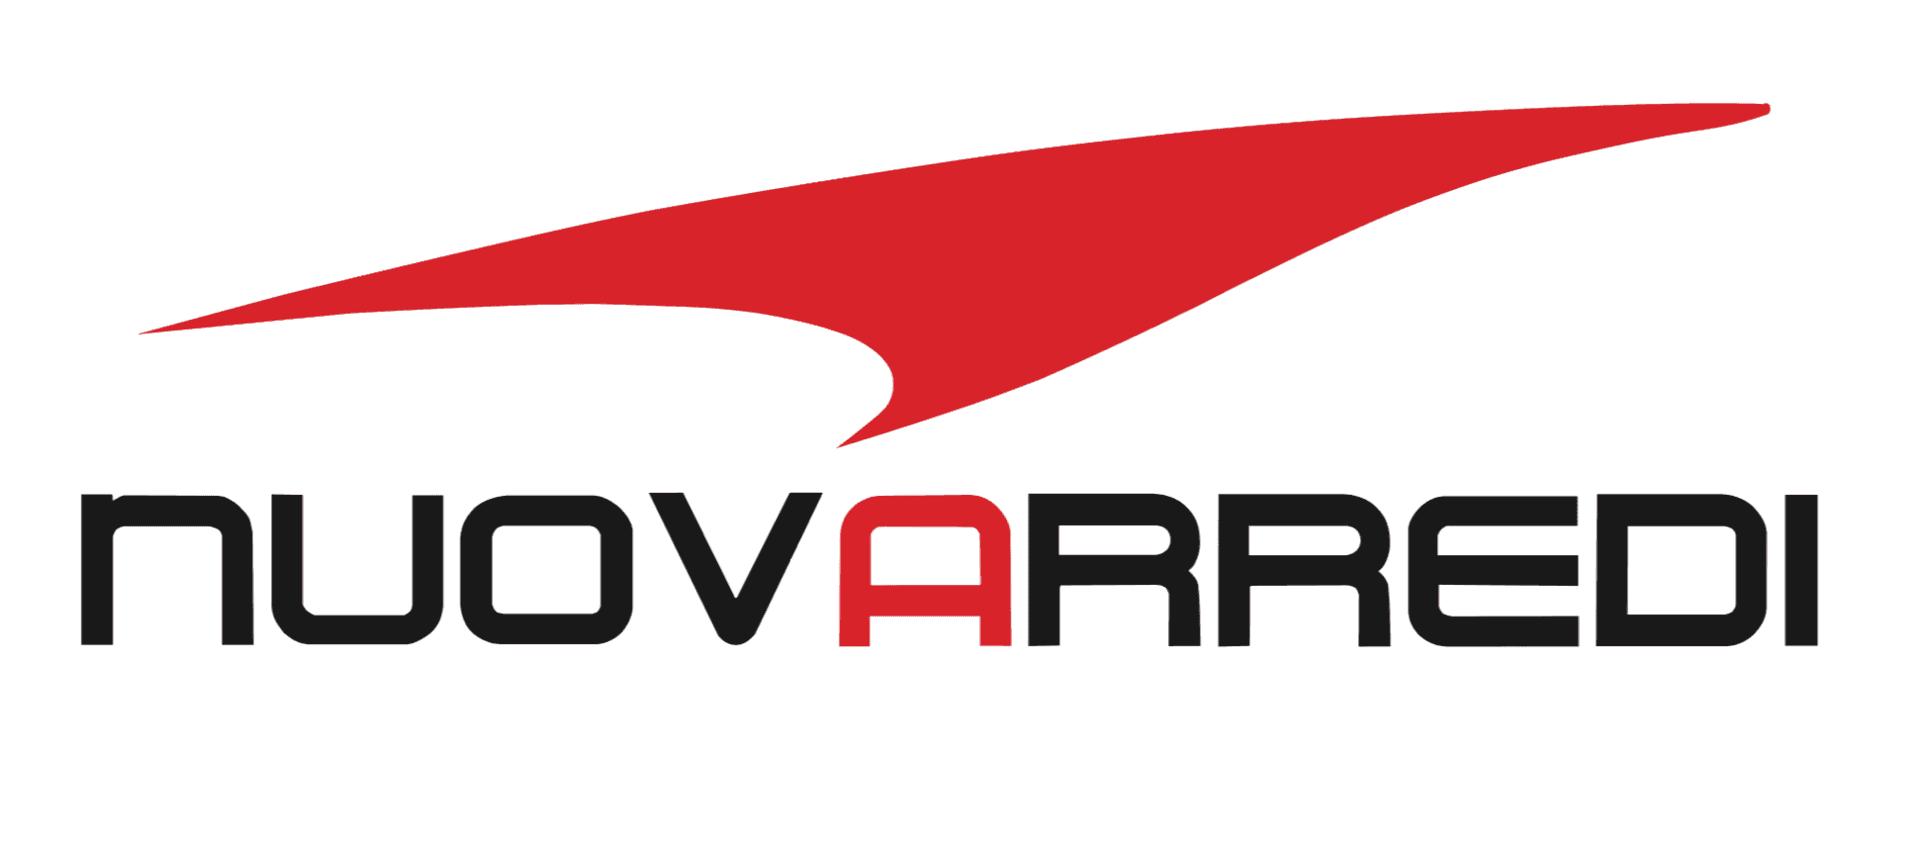 NUOVARREDI di MUNARI MAURO - Logo